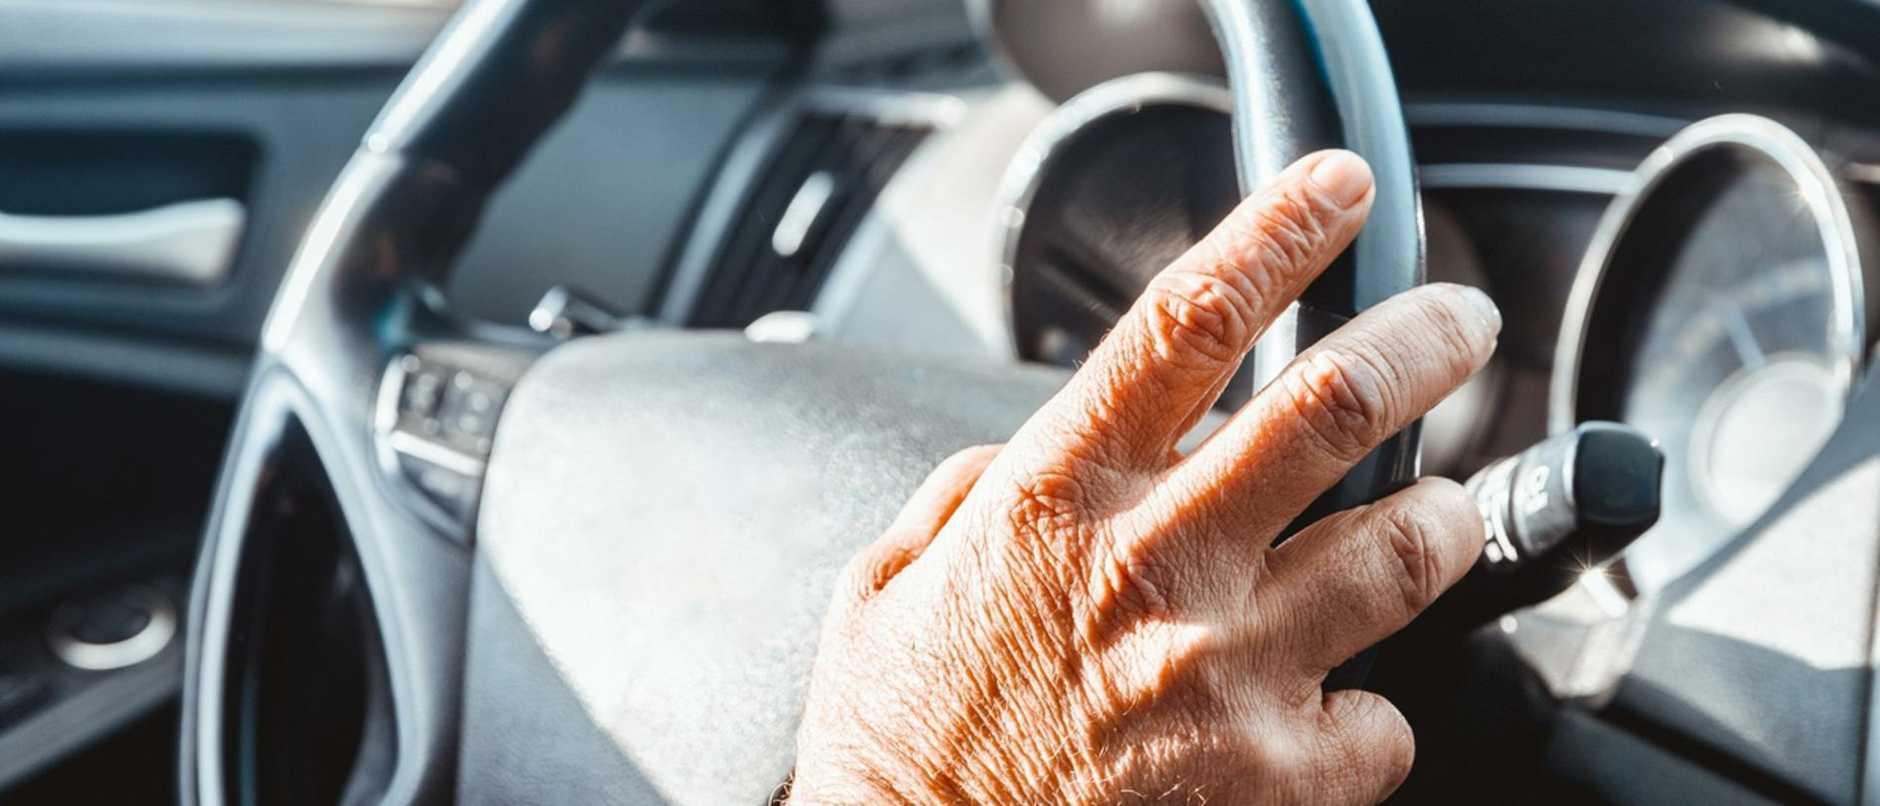 Senior Adult's Hand on the Steering Wheel